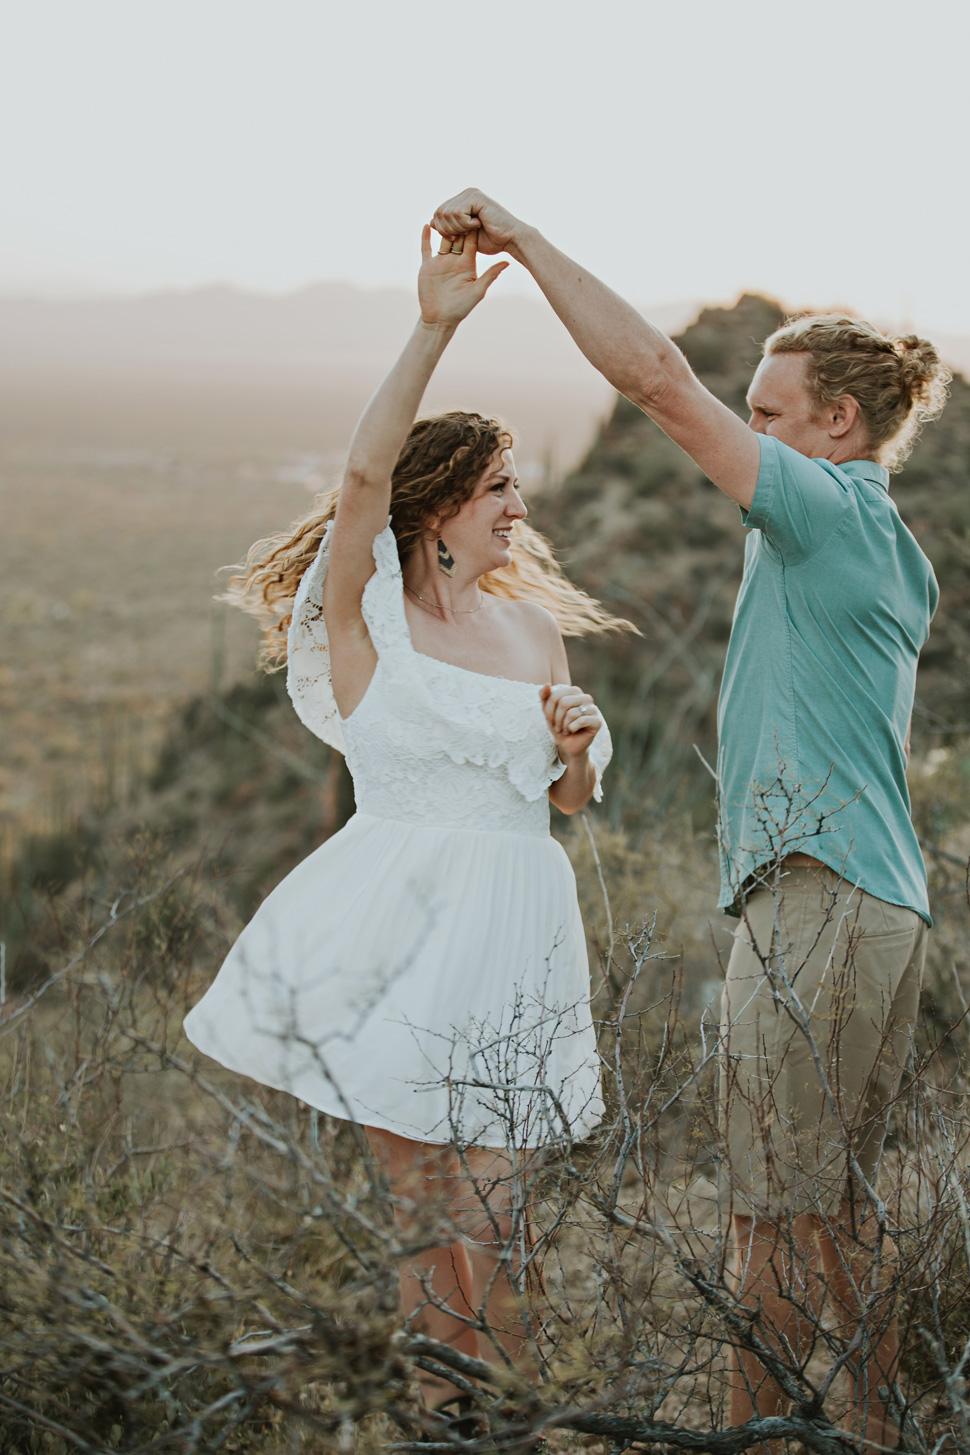 CindyGiovagnoli_Tucson_Arizona_engagement_lifestyle_portrait_Airstream_Excella_travel_trailer_camper_Saguaro_National_Park-043.jpg